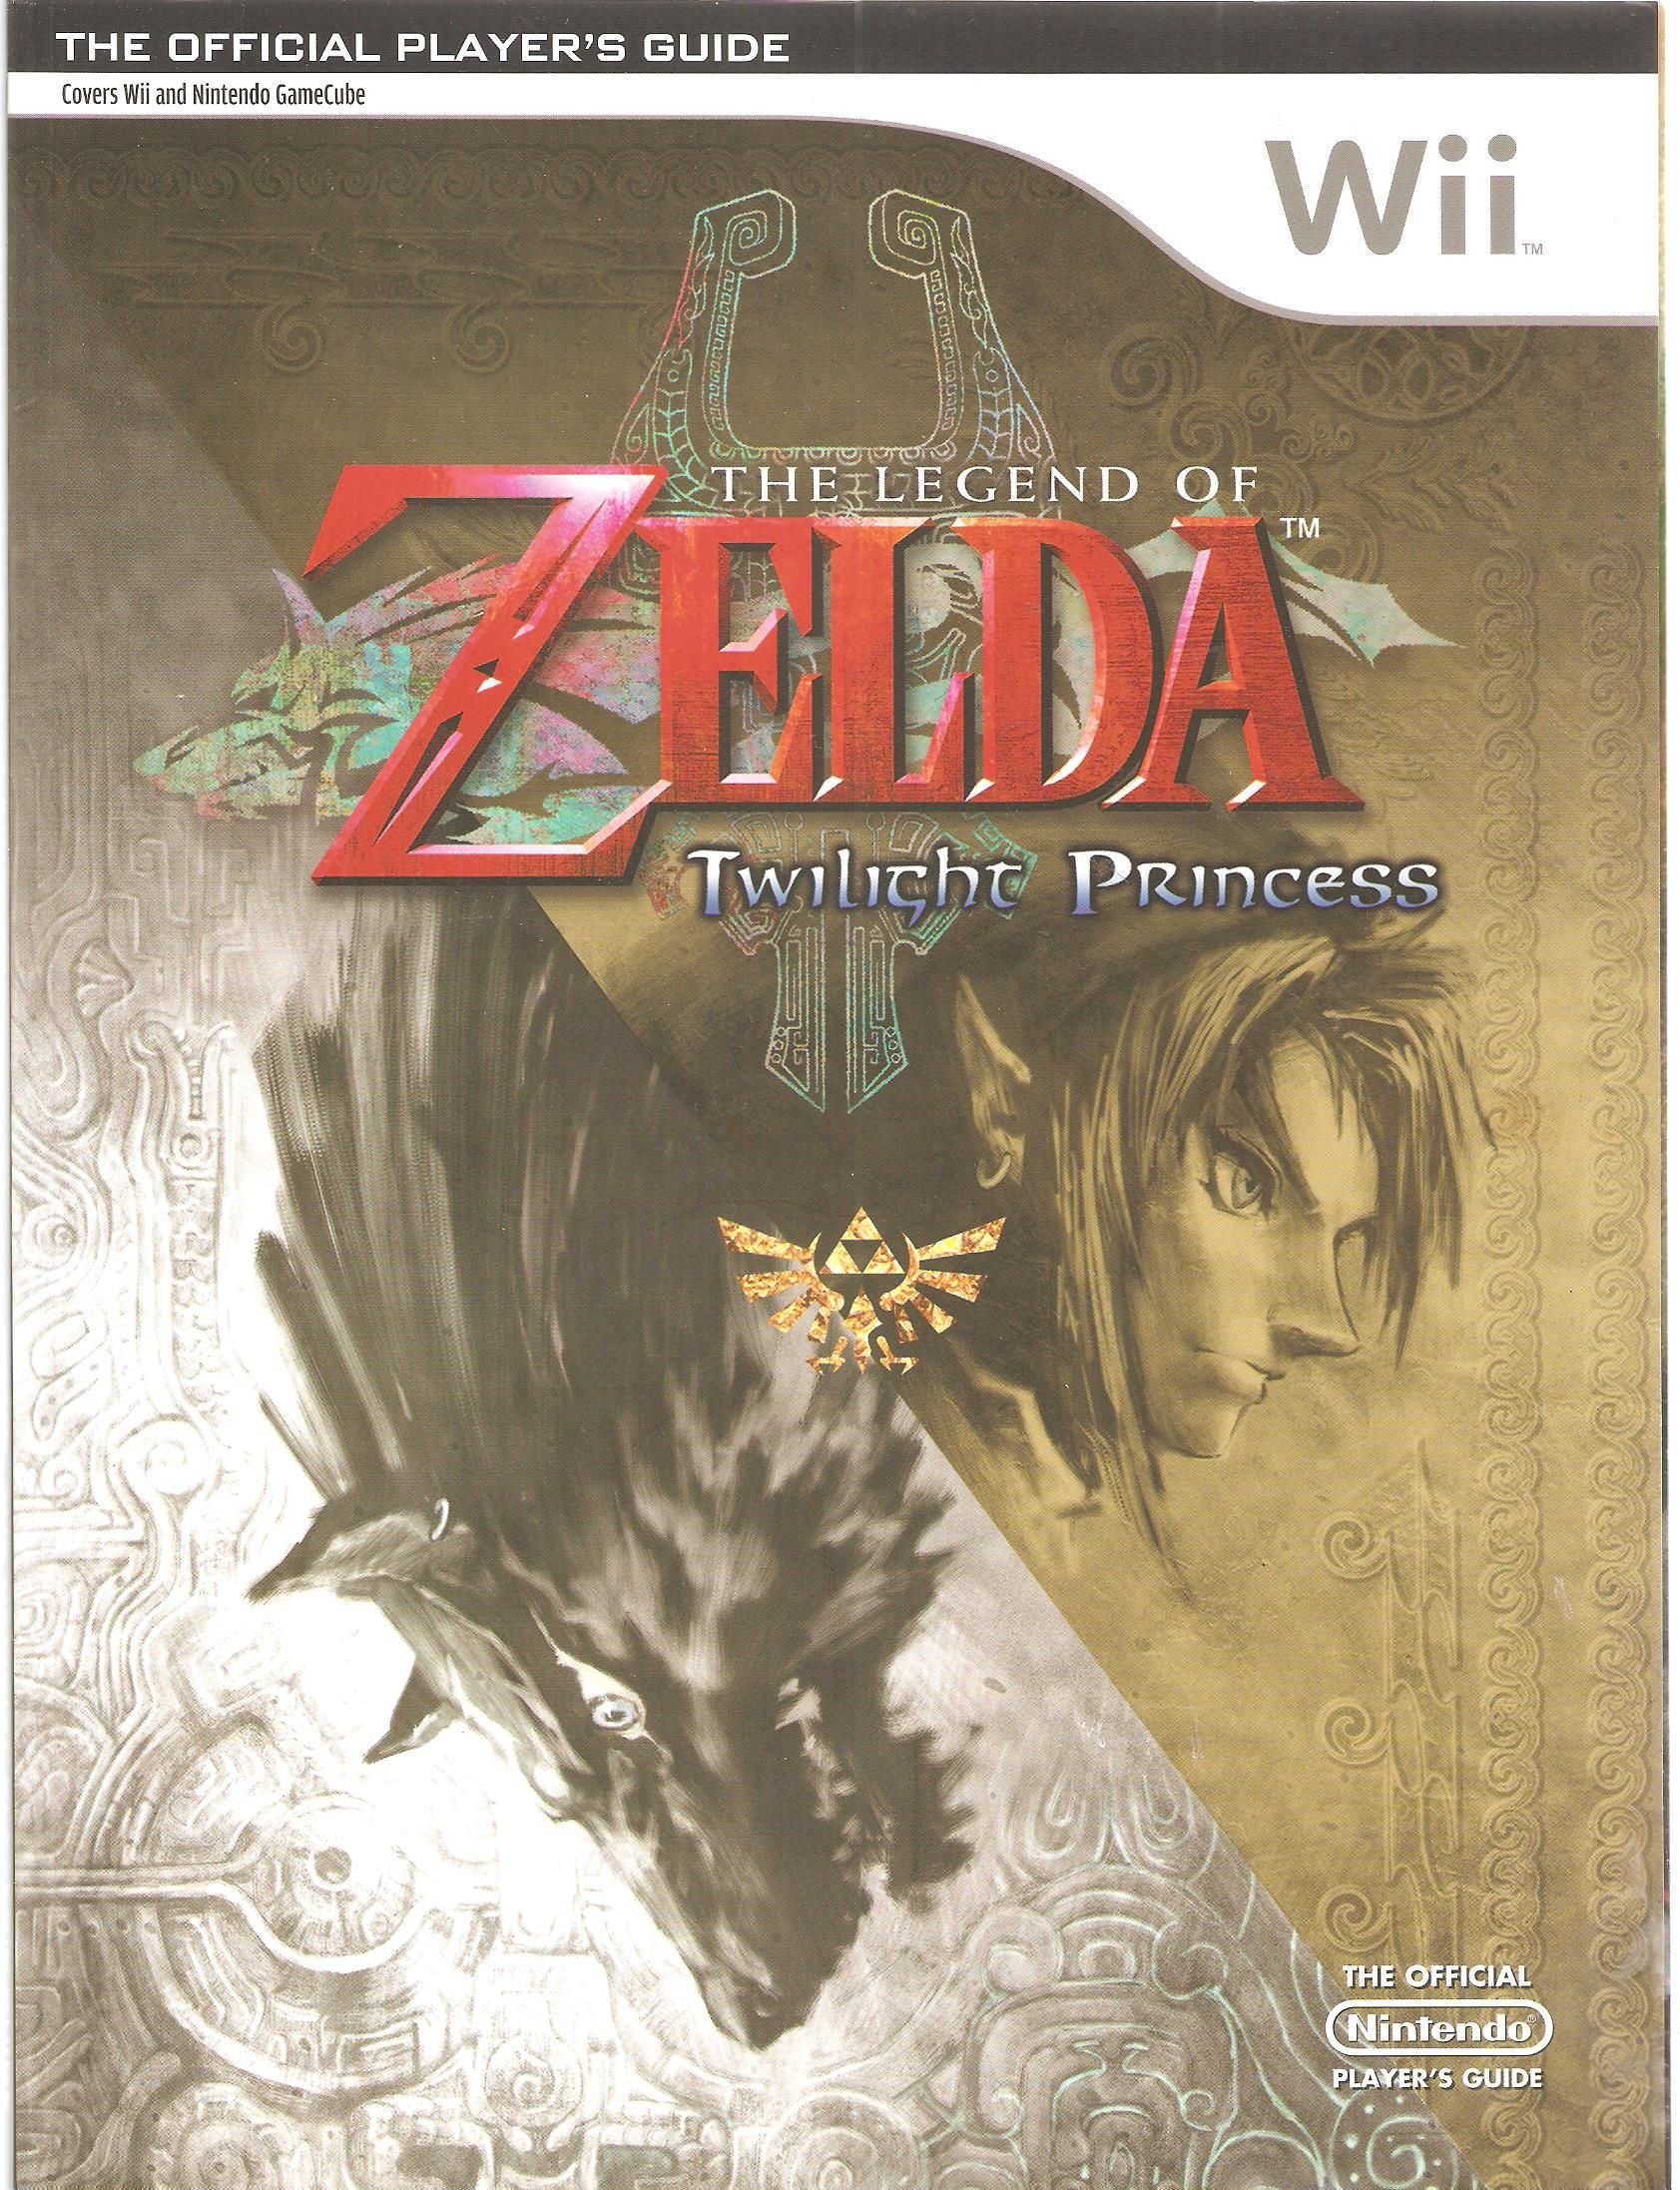 the legend of zelda twilight princess computer game guides rh pinterest com please love my computer game guide Consumer Guide Computers Ratings